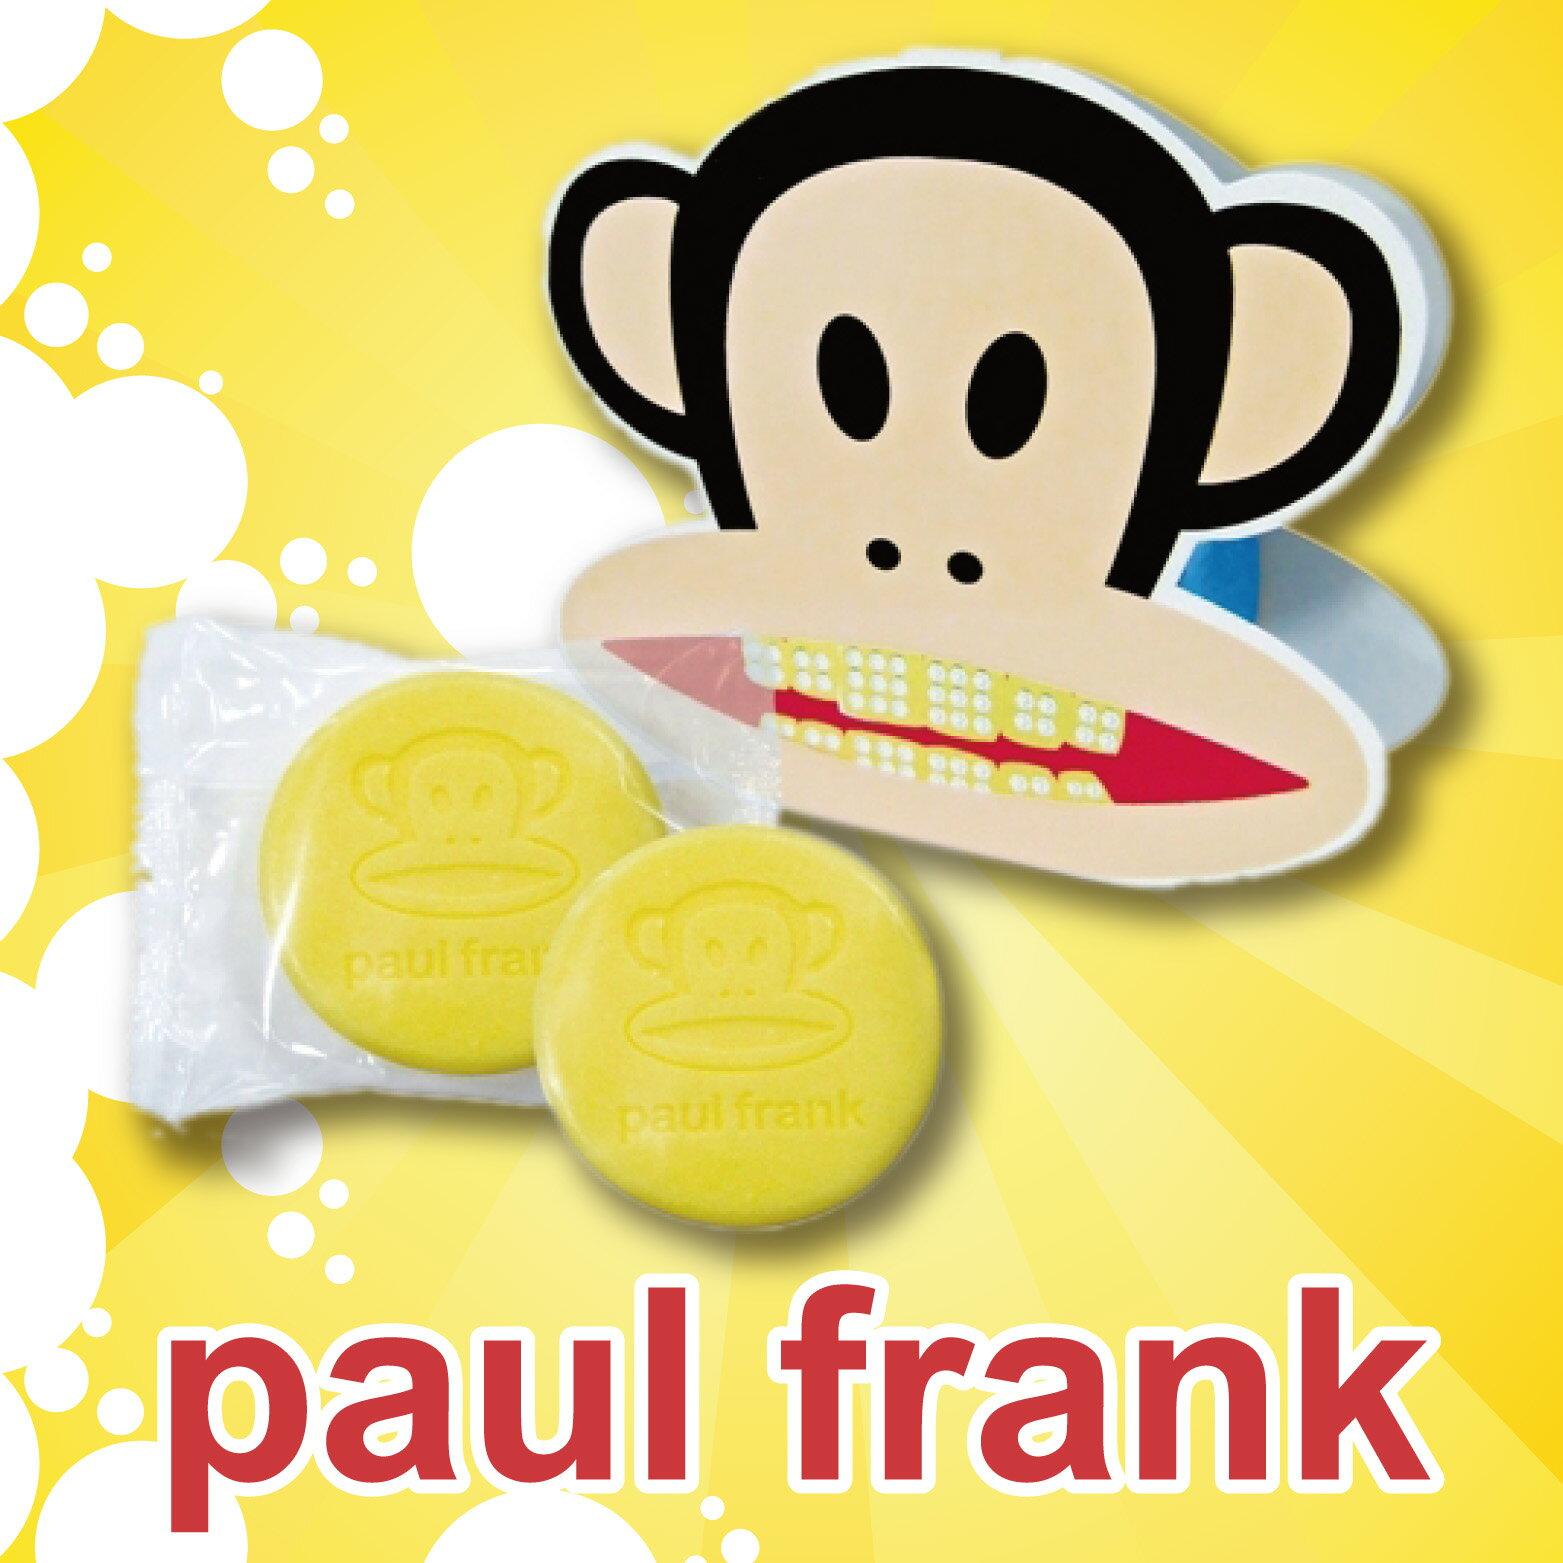 ☆ paul frank ☆ 大嘴猴 正版授權洋甘菊精油潤膚皂 個別造型包裝 適合婚禮小物/贈品